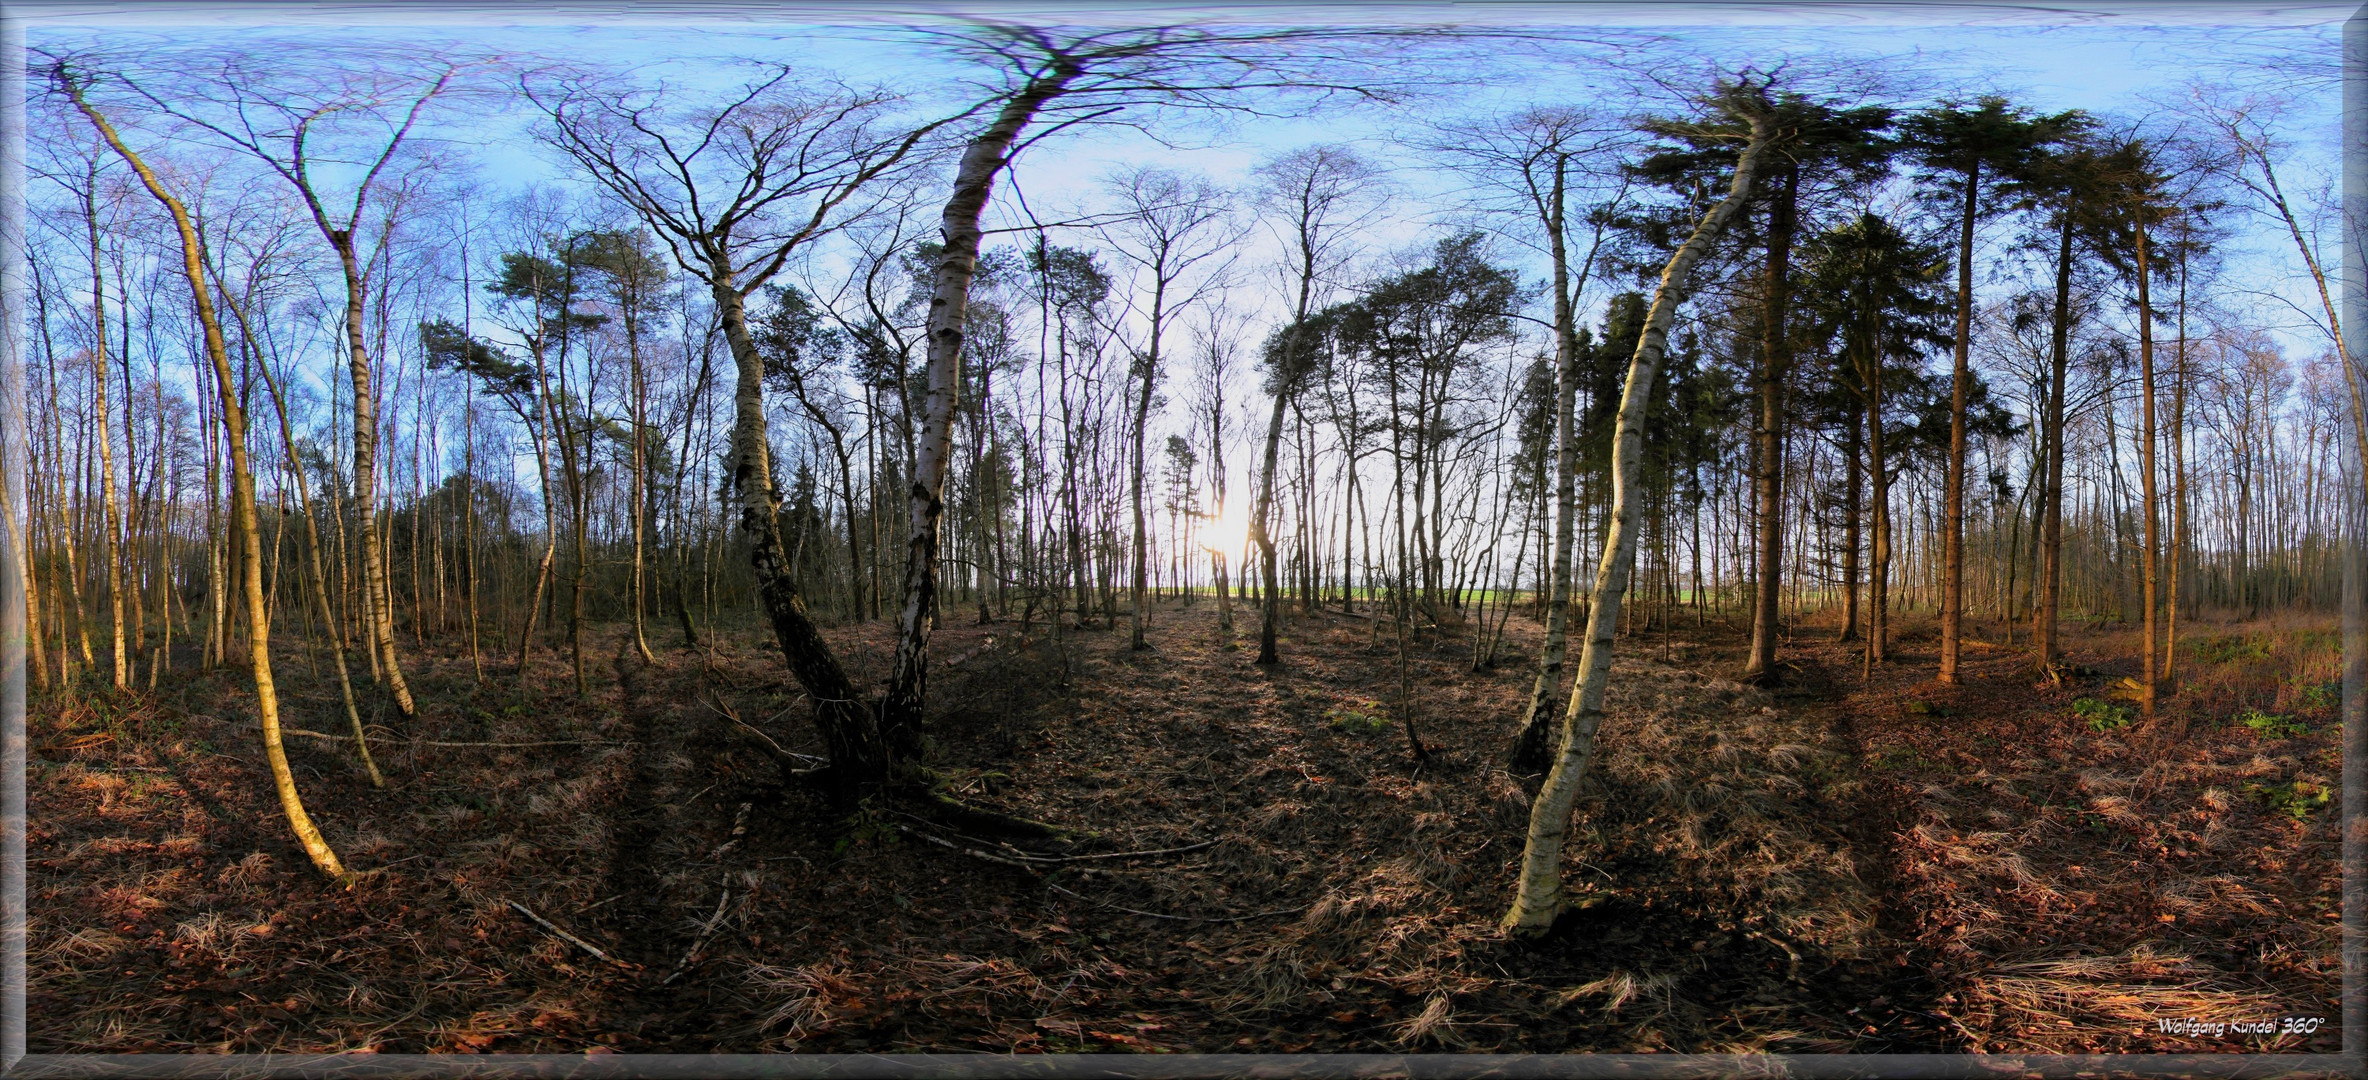 Wald rum - ein Panorama